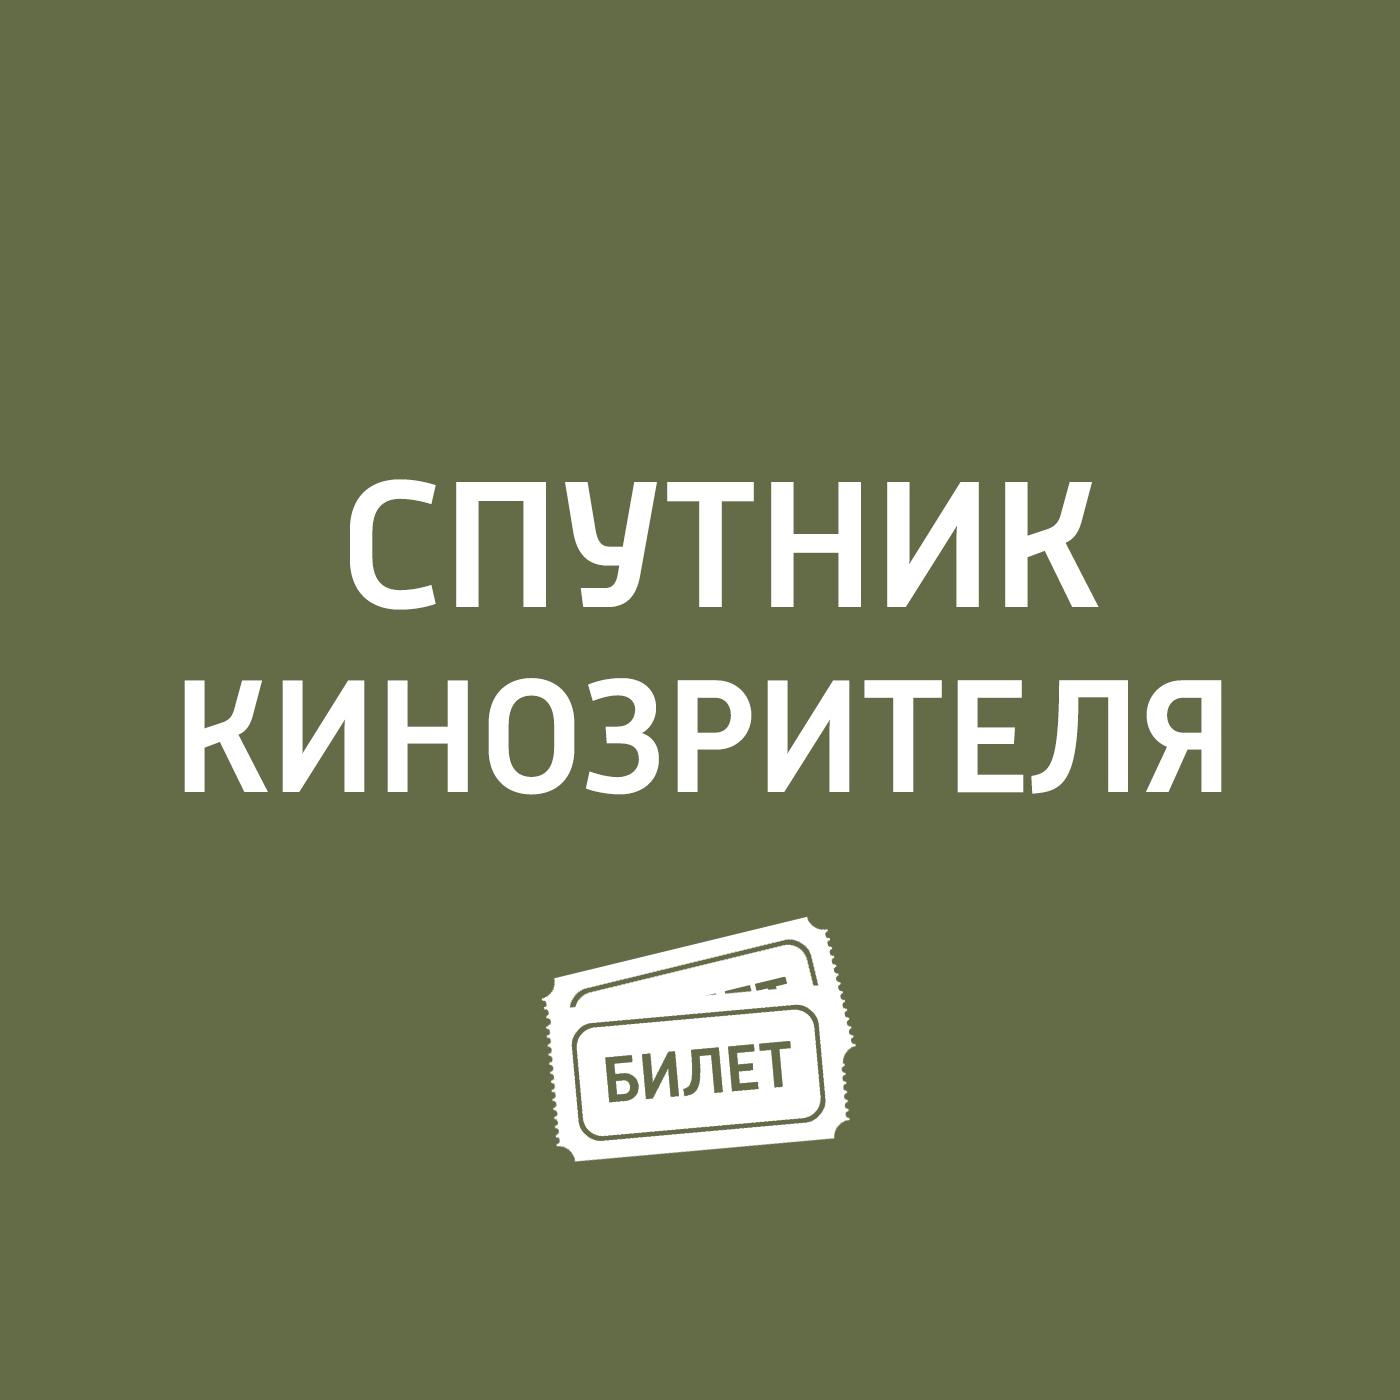 Антон Долин «Излом времени»; «Пассажир»; «Ну, здравствуй, Оксана Соколова!»; «Ева»...